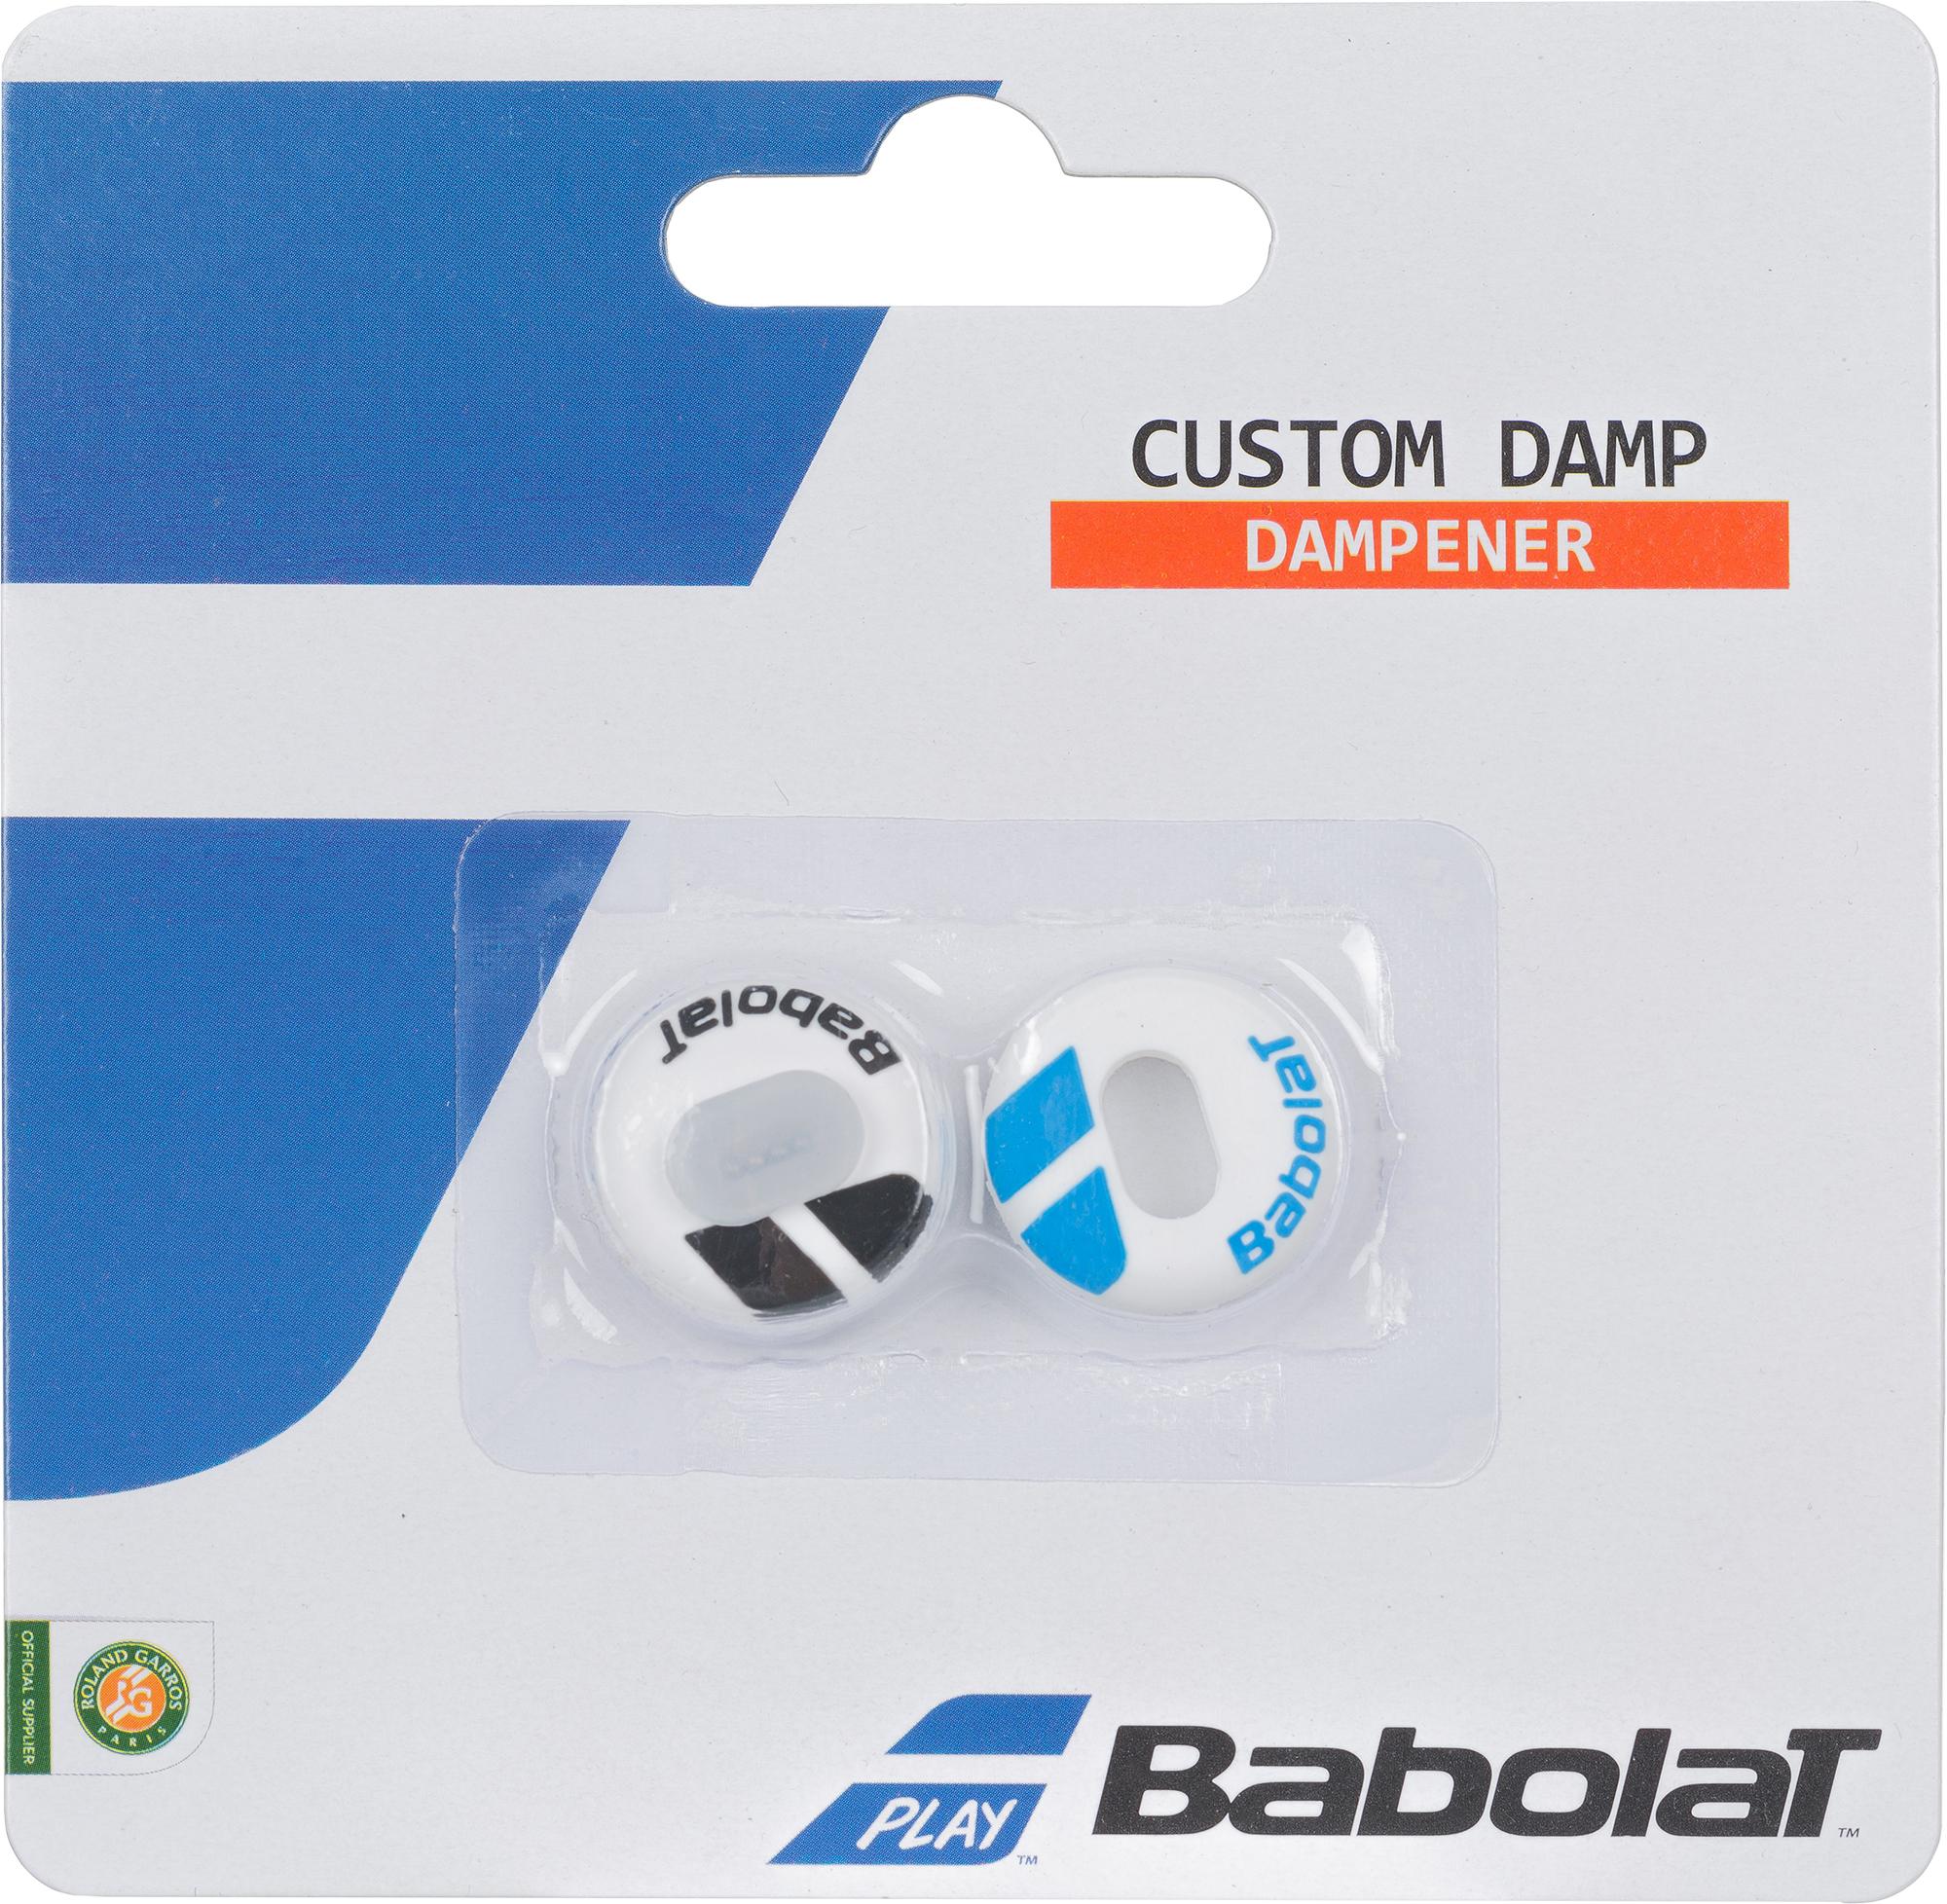 Babolat Виброгаситель Babolat Custom Damp x2 babolat виброгаситель babolat flag damp x 2 размер без размера